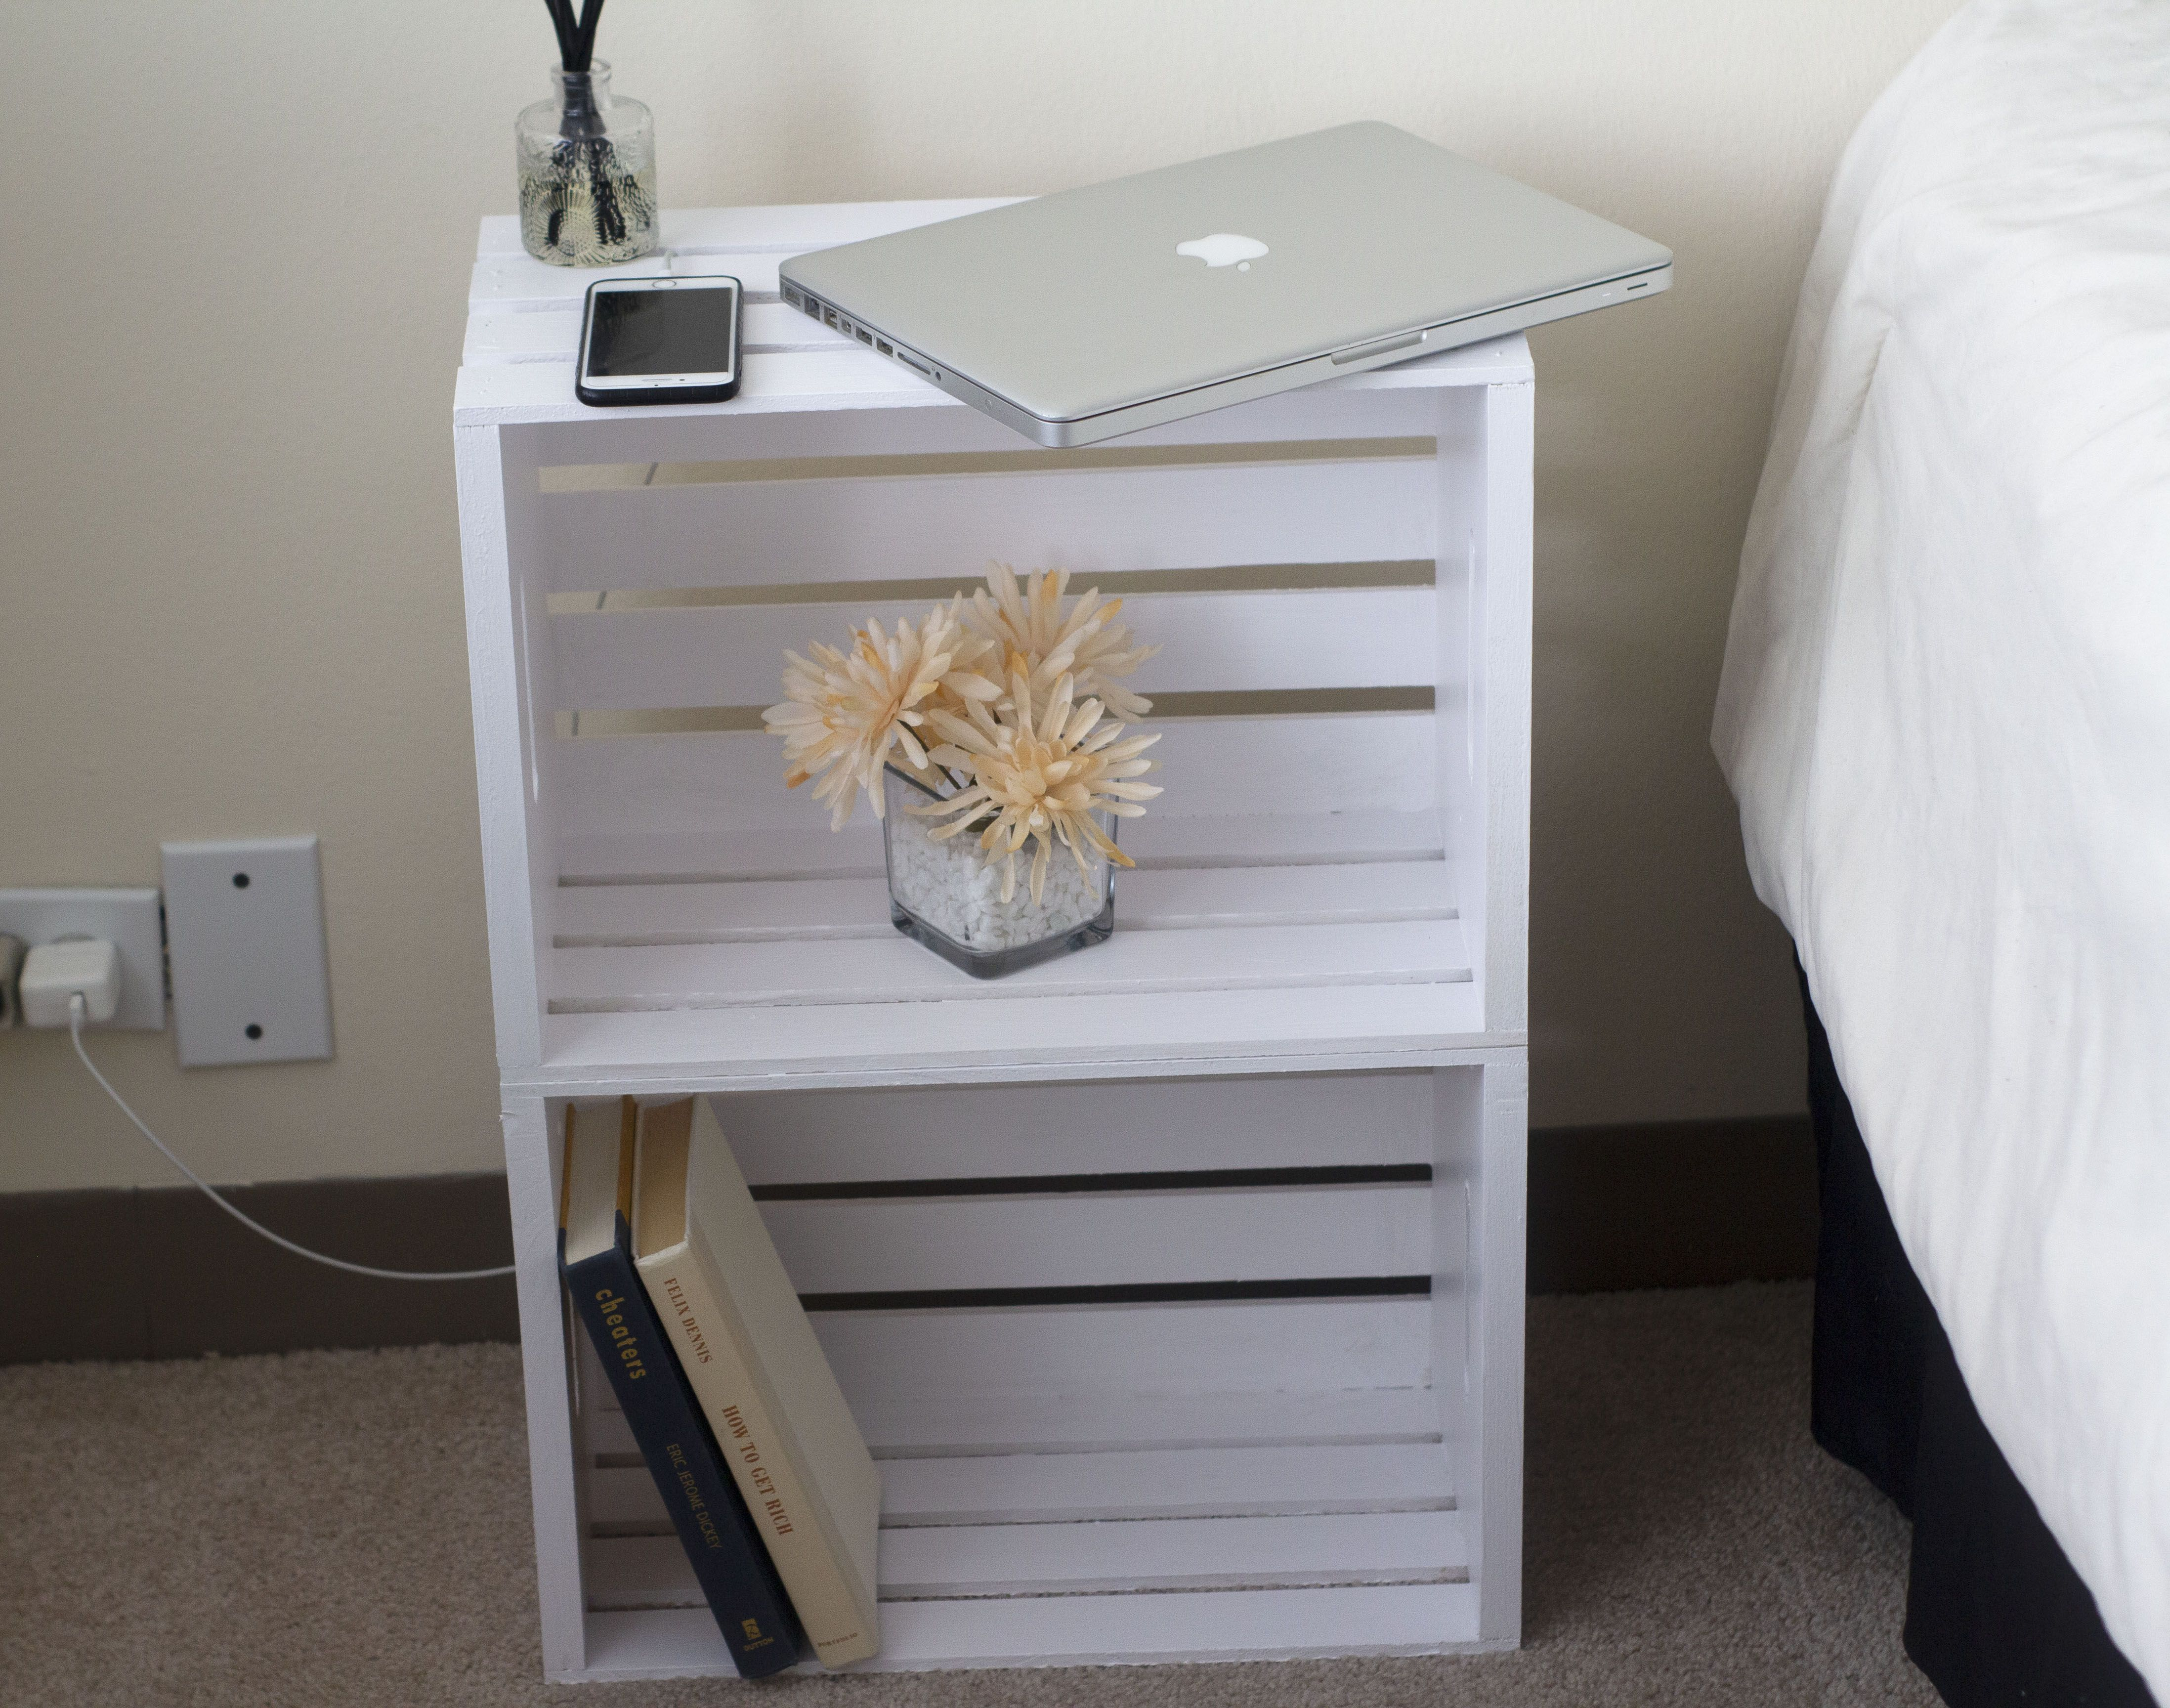 quick and easy diy nightstand diy nightstand crate nightstand wooden crates nightstand